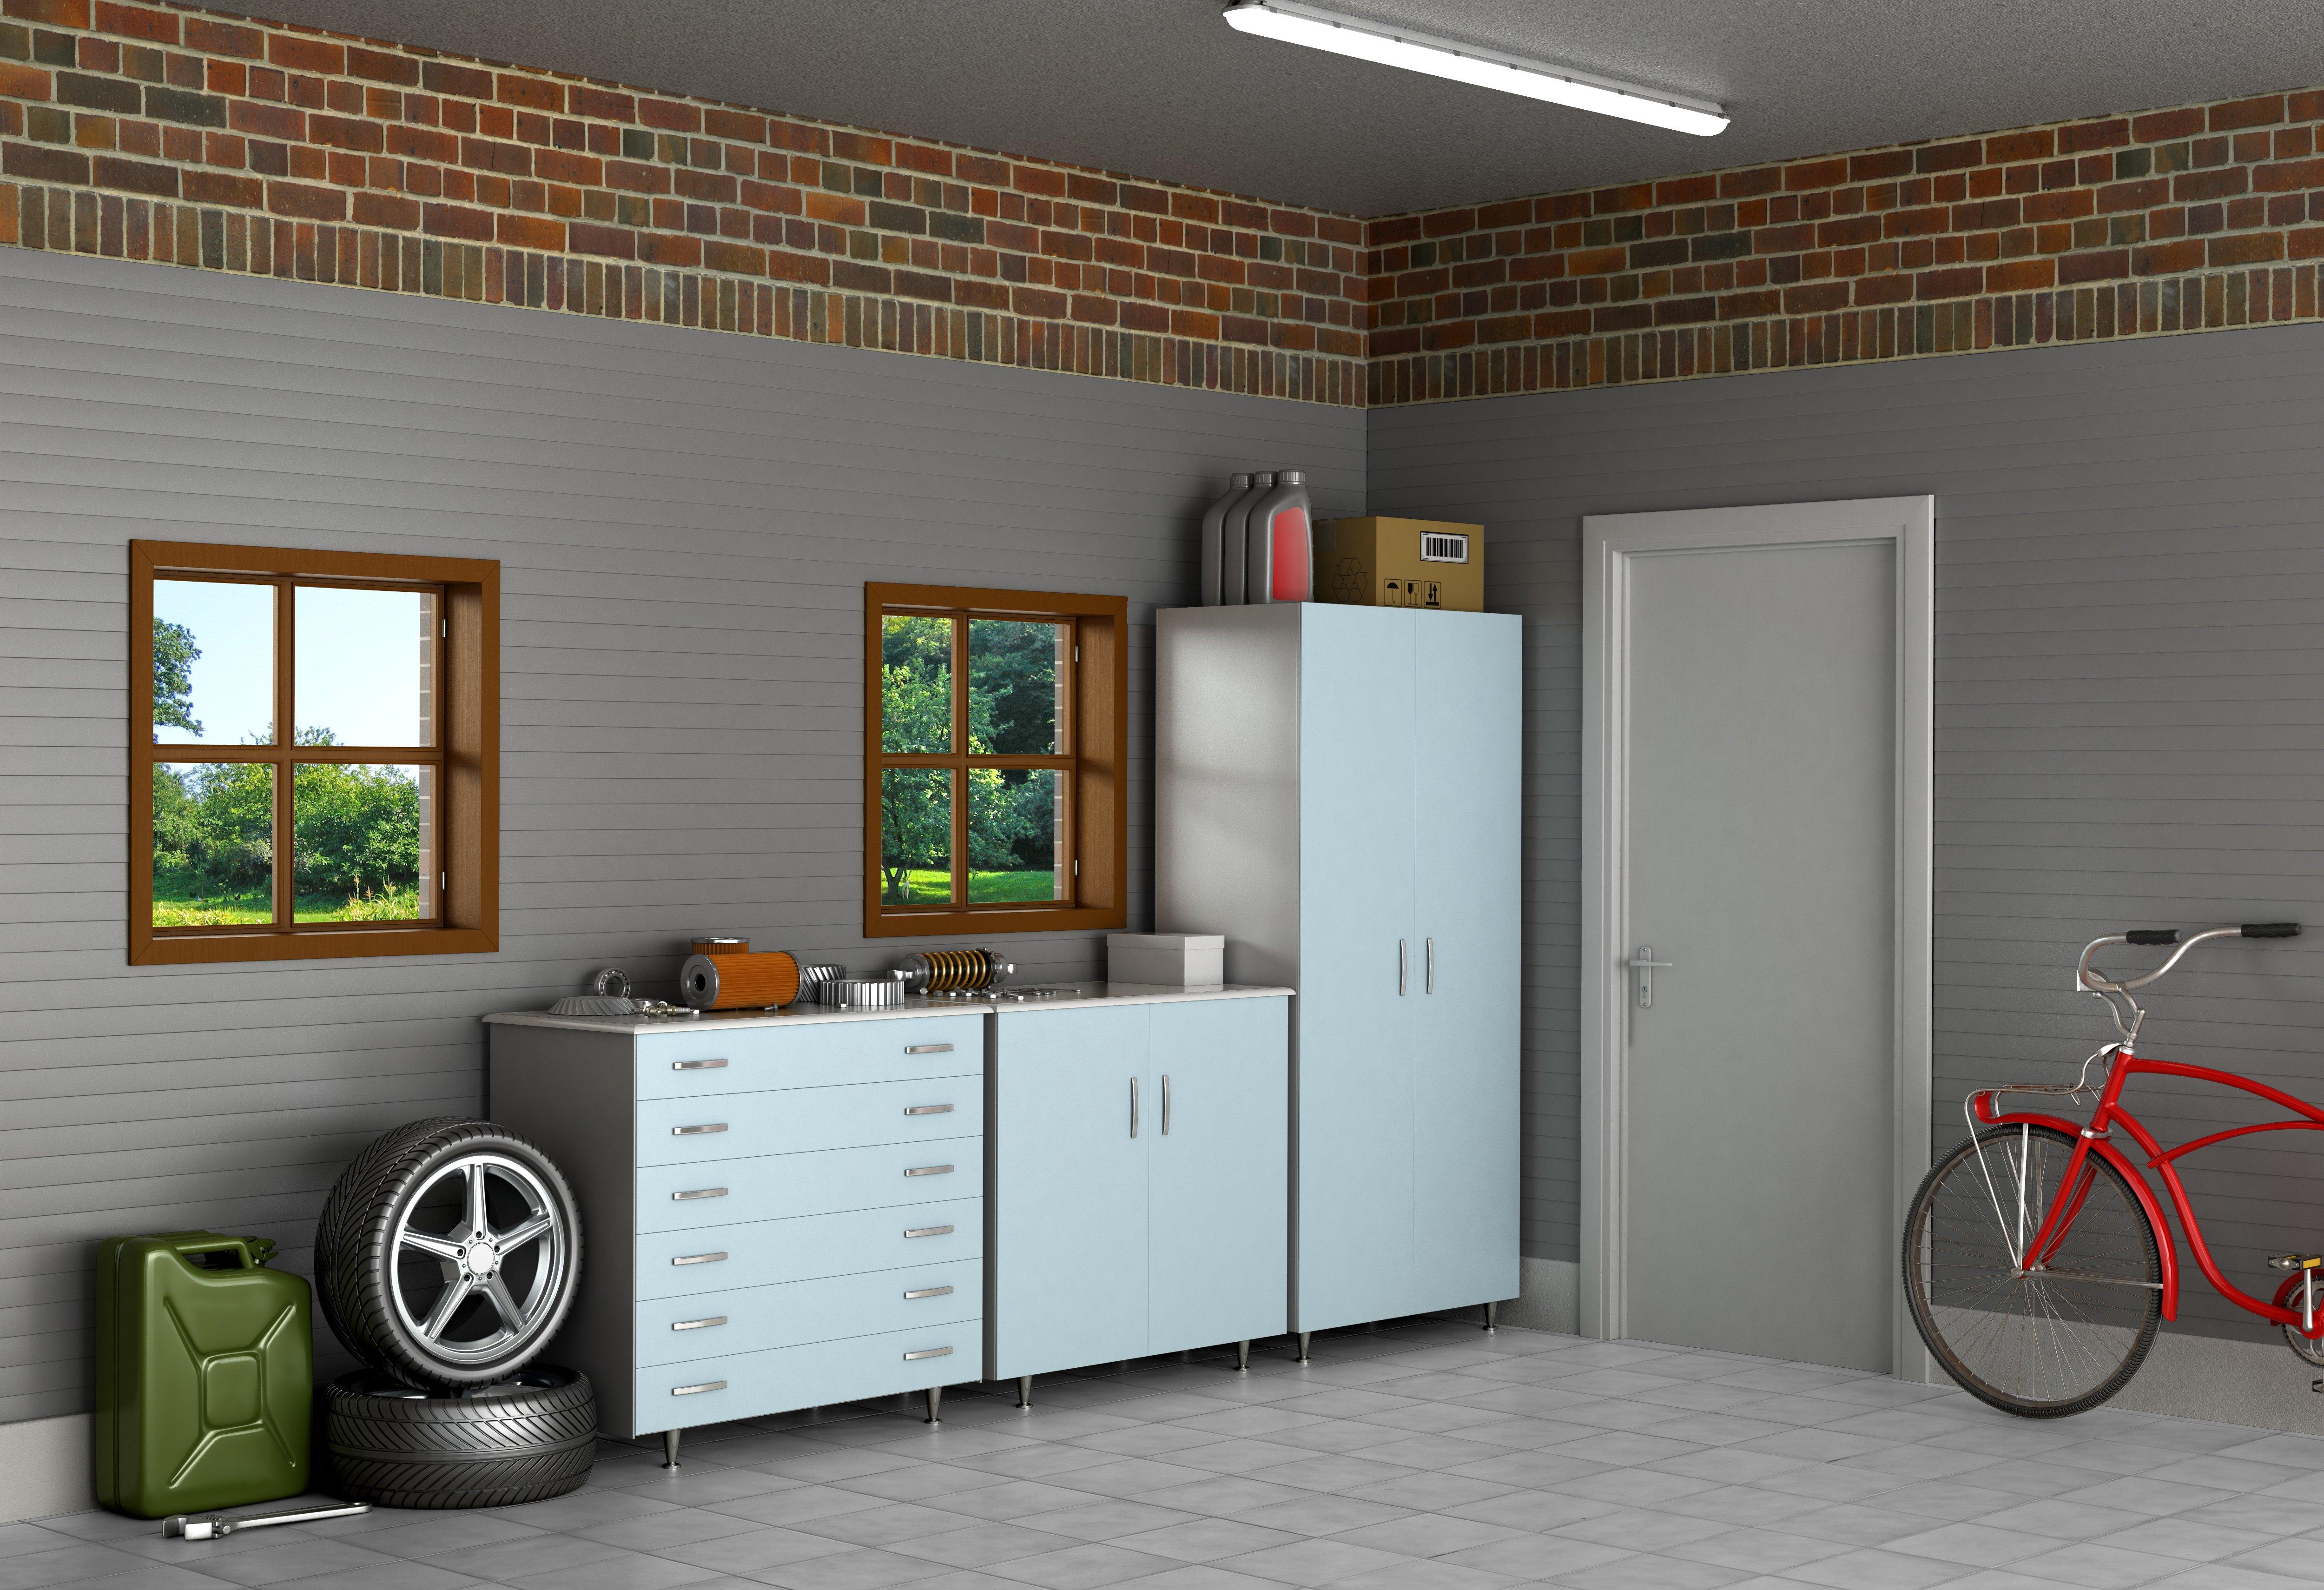 shutterstock_387635068